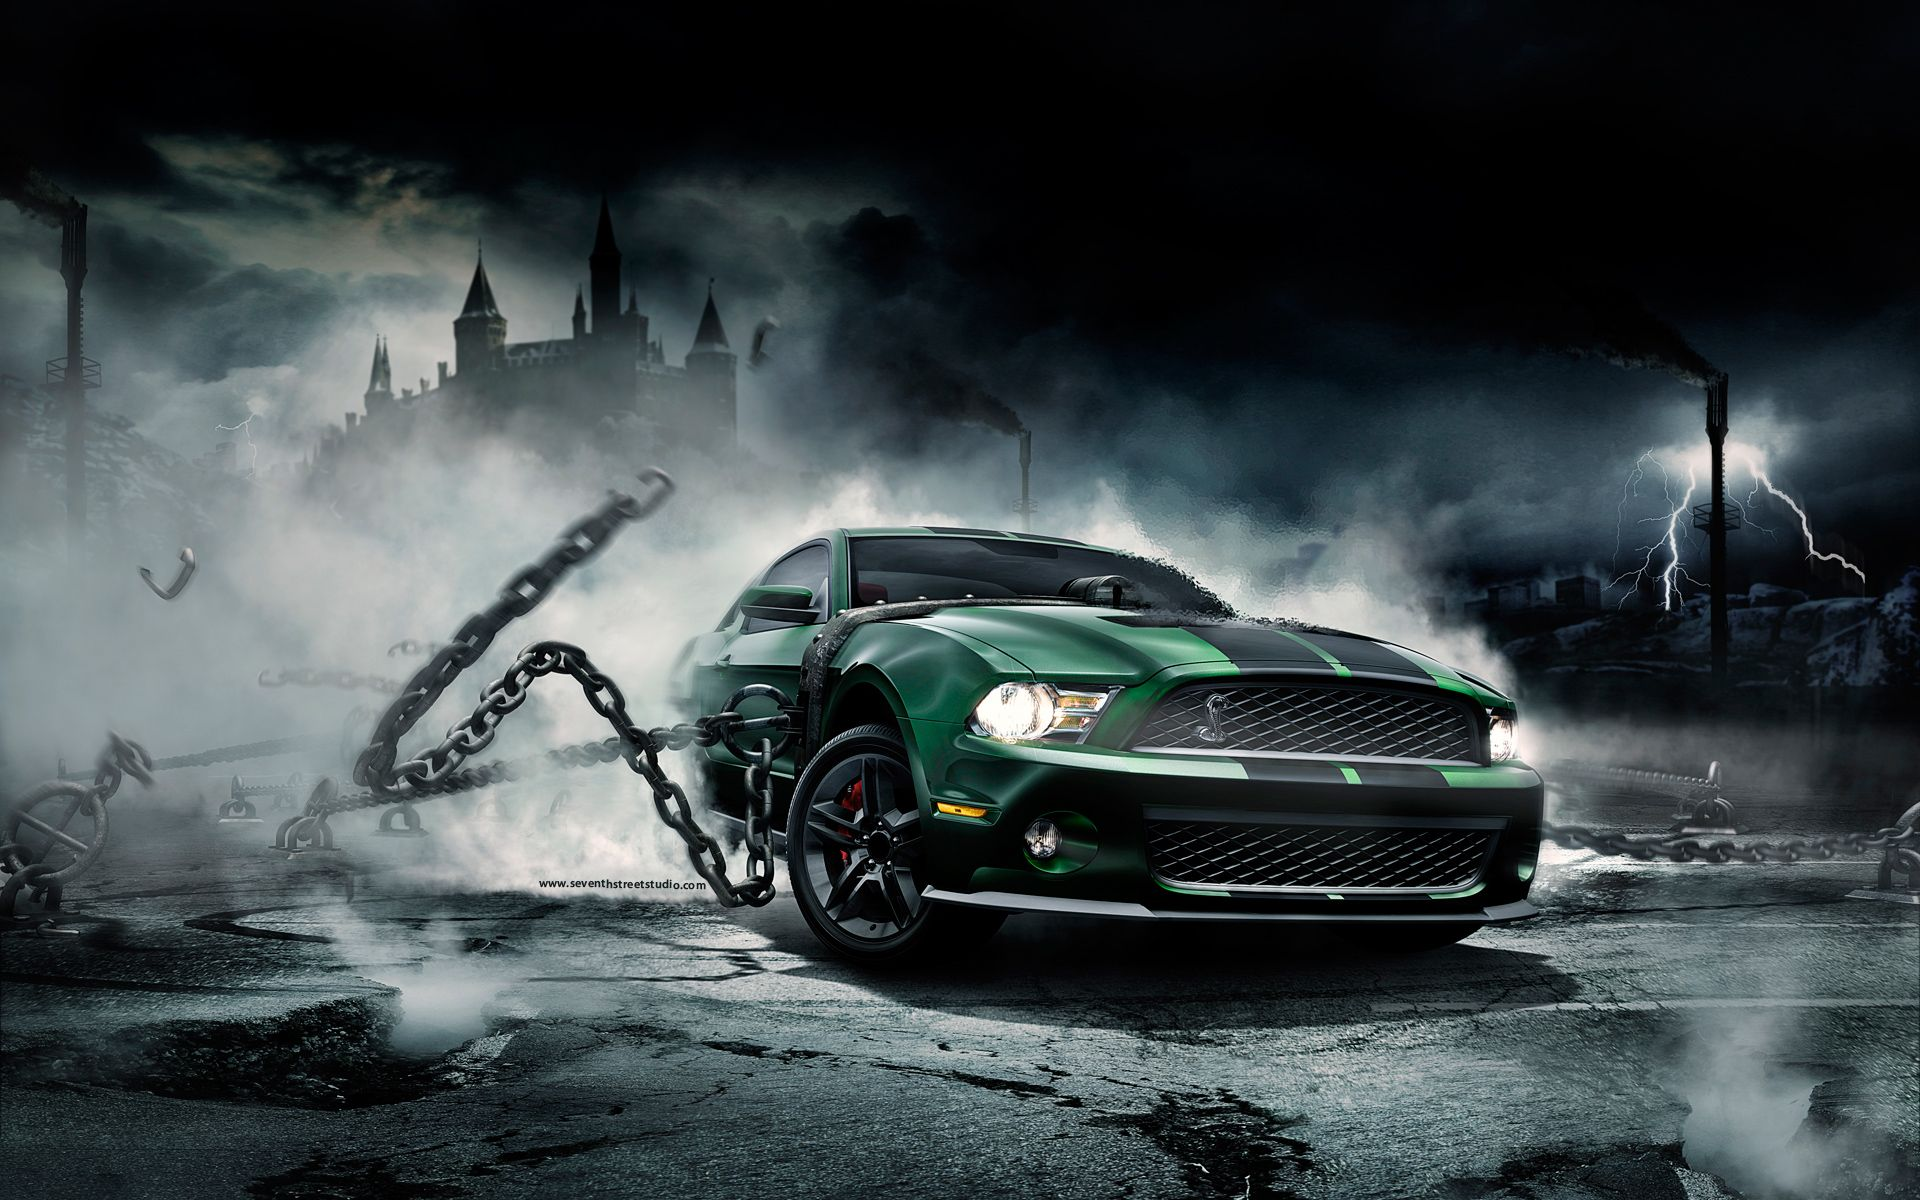 My Today S Wallpaper A Monster Mustang Its Definitely Better Den Yours Wallpaper Super Araba Araba Guclu Amerikan Arabalari